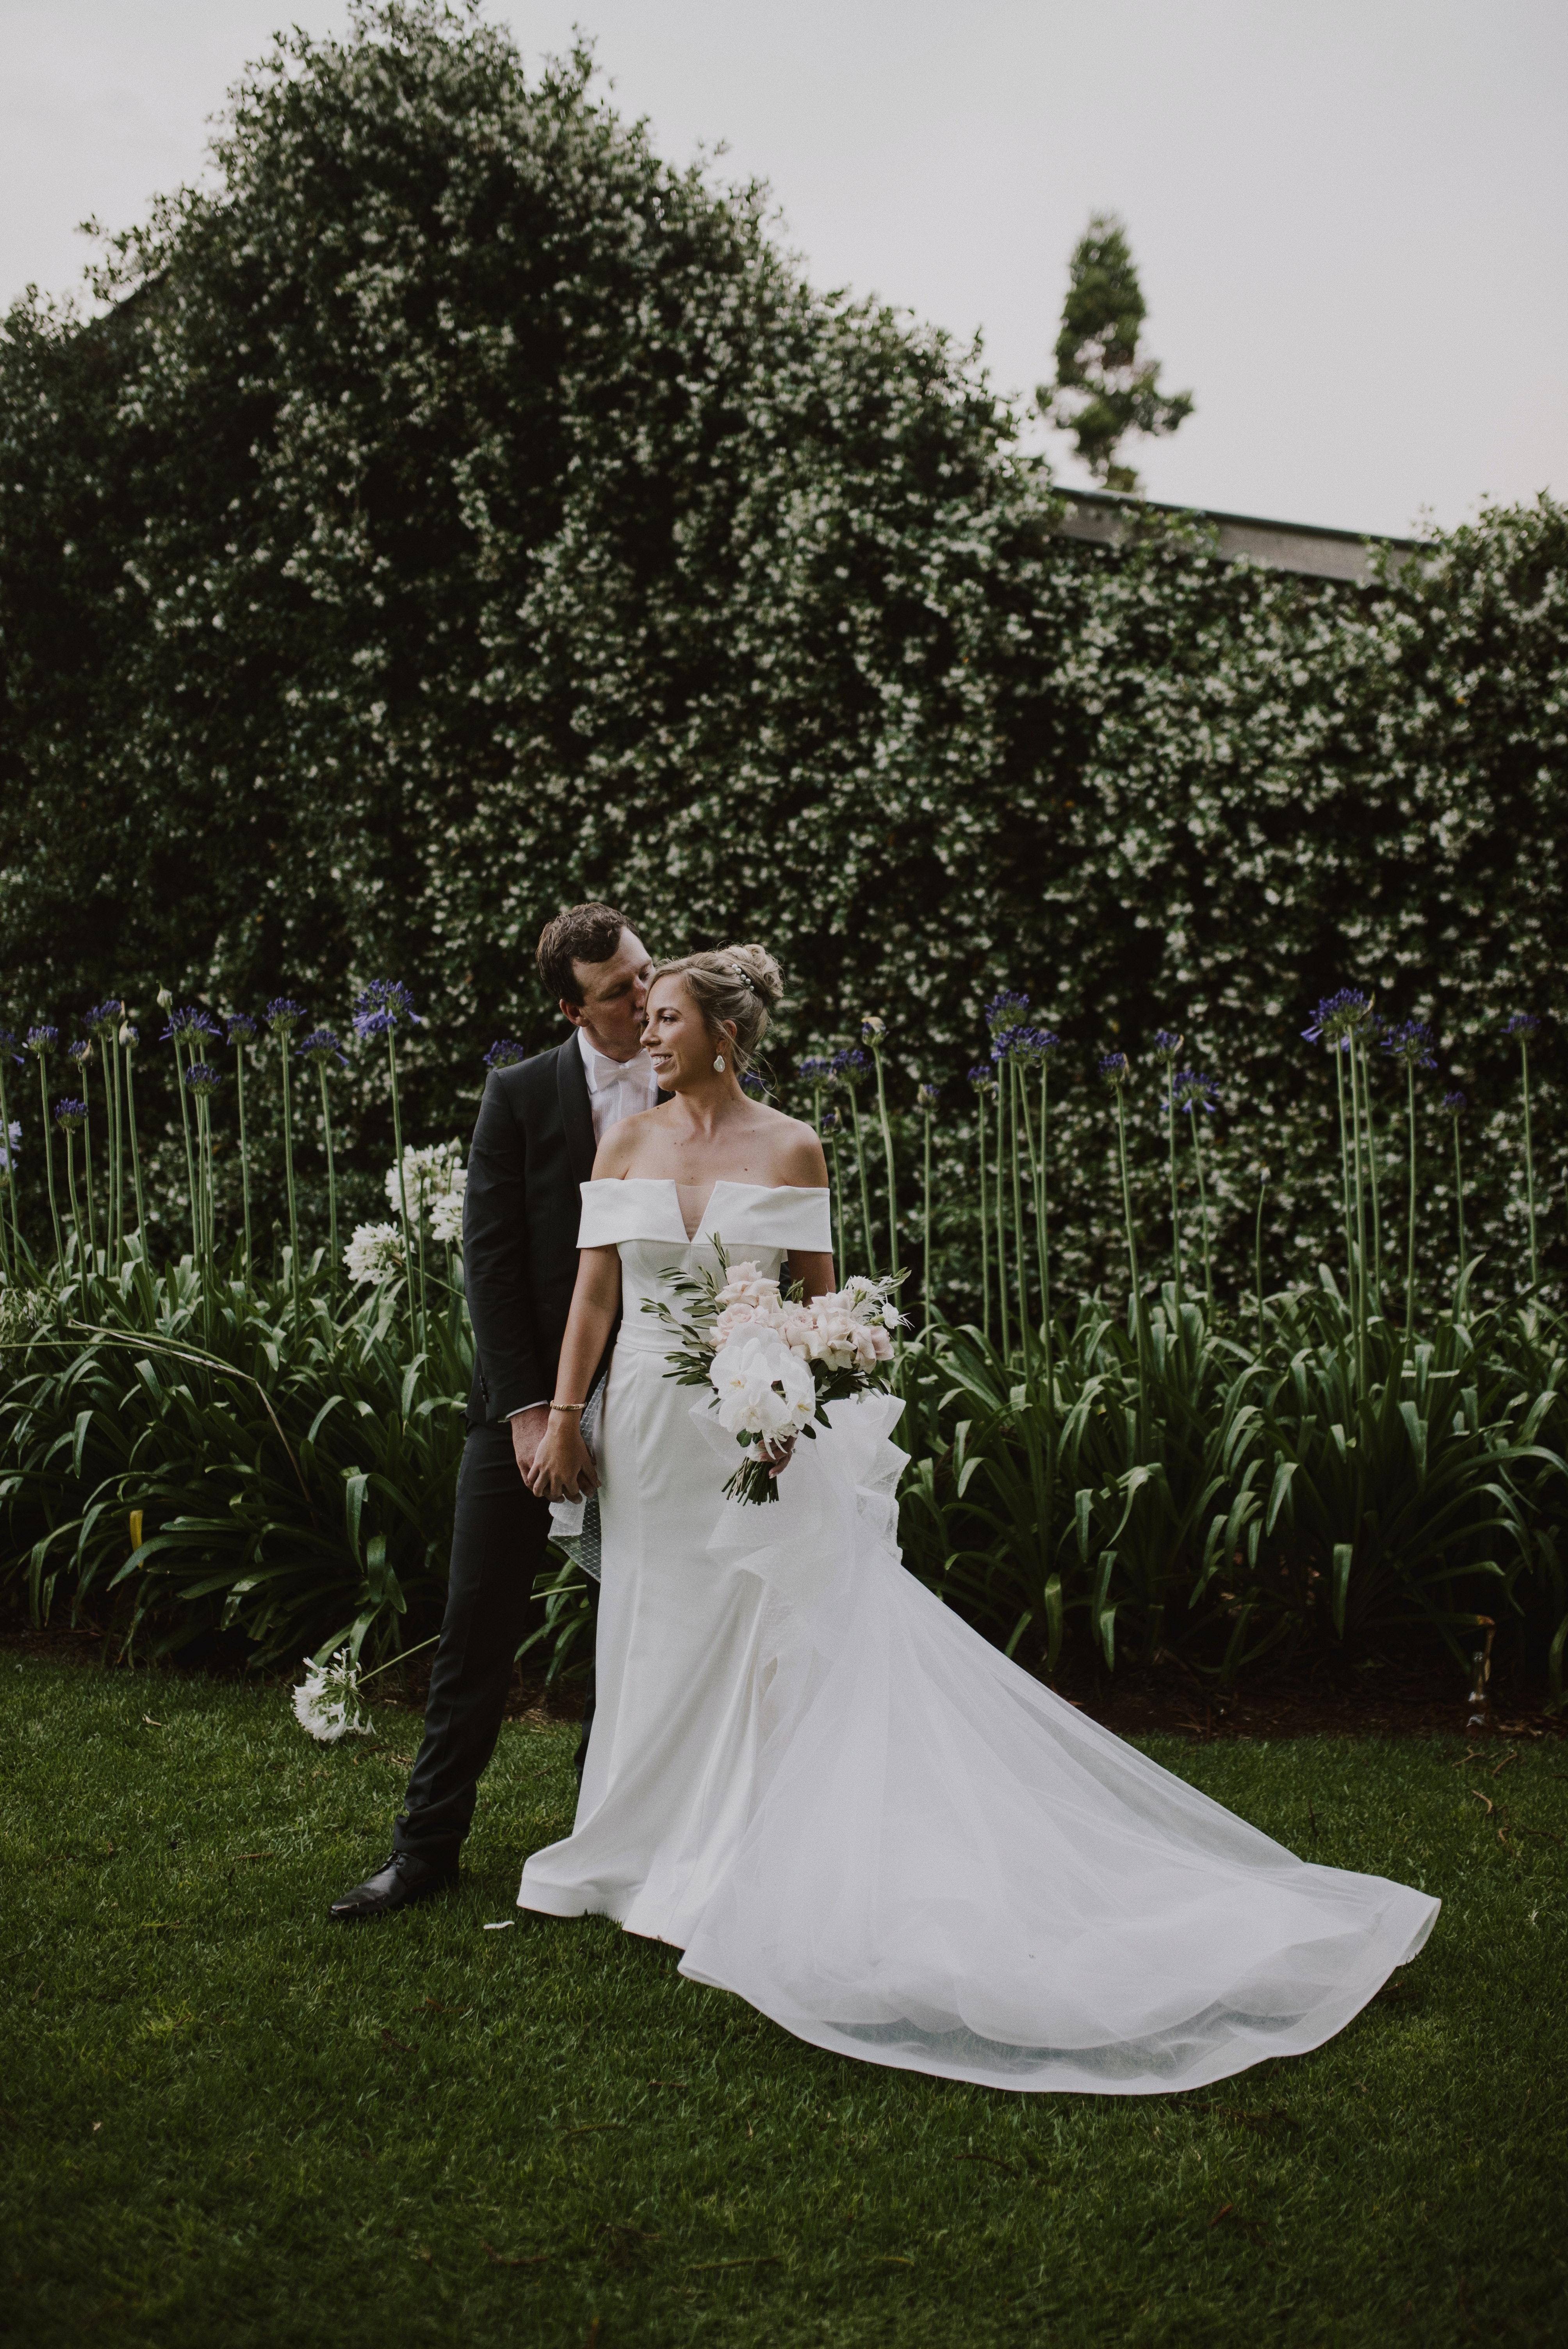 Bride and groom standing in front of jasmine vine kissing